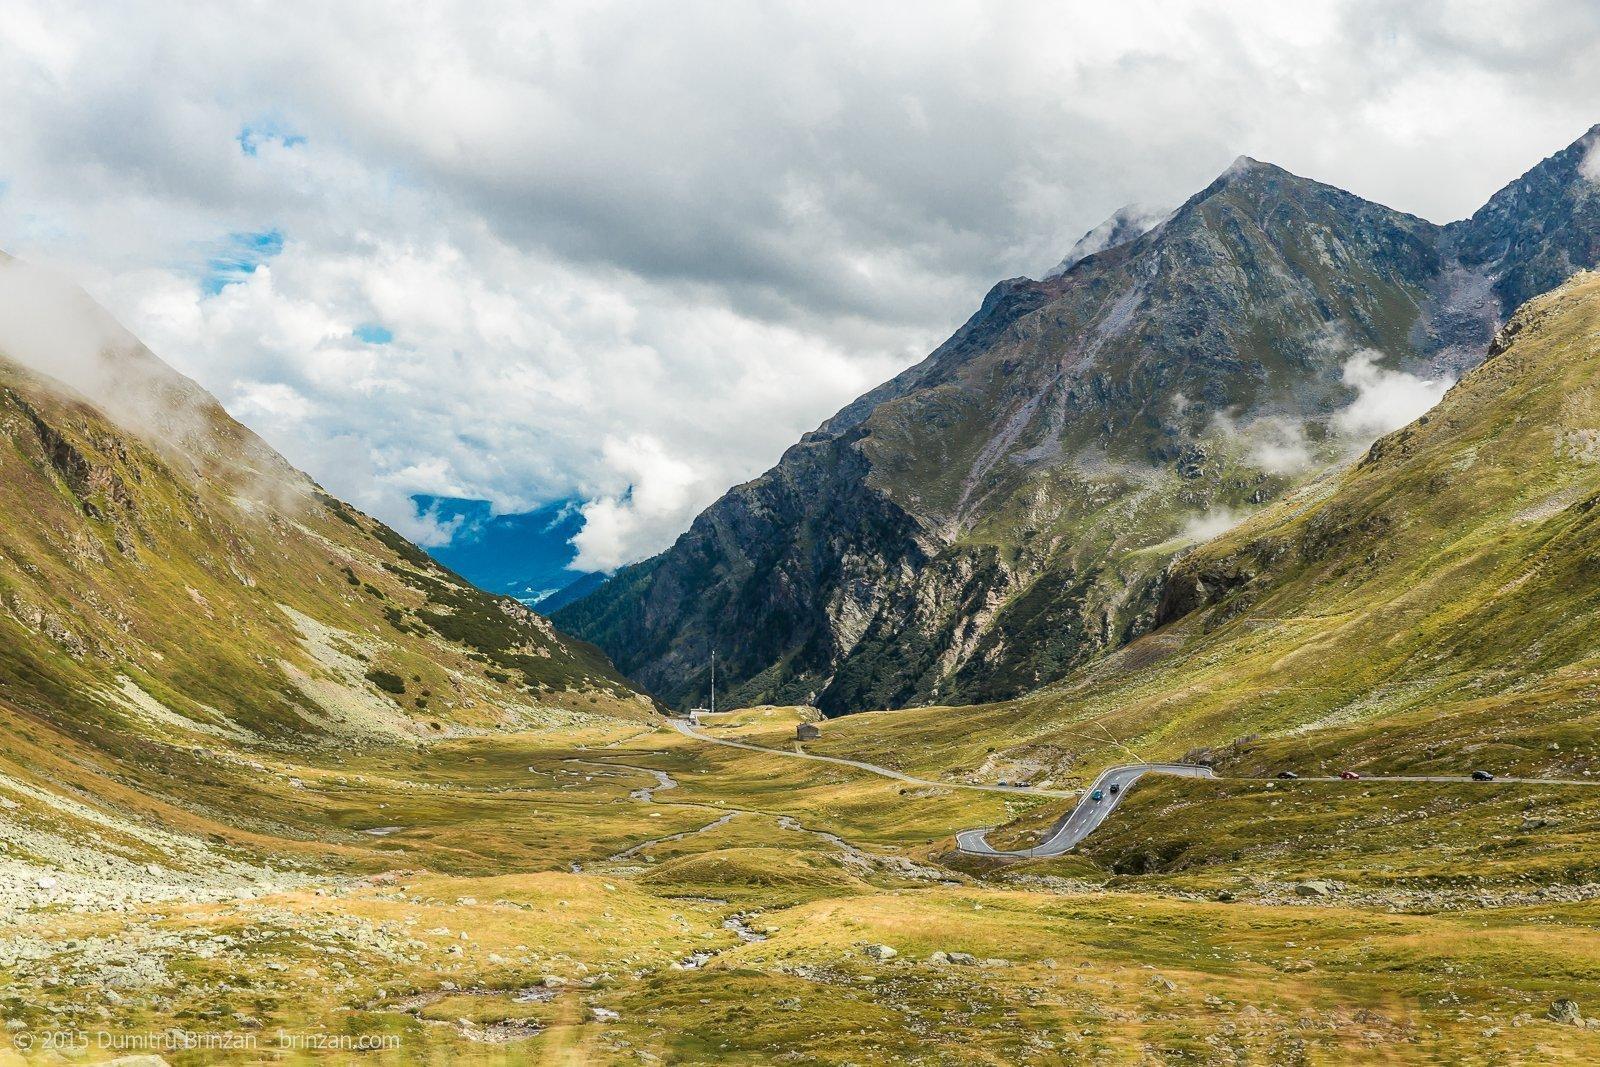 fluela-pass-switzerland-2015-5